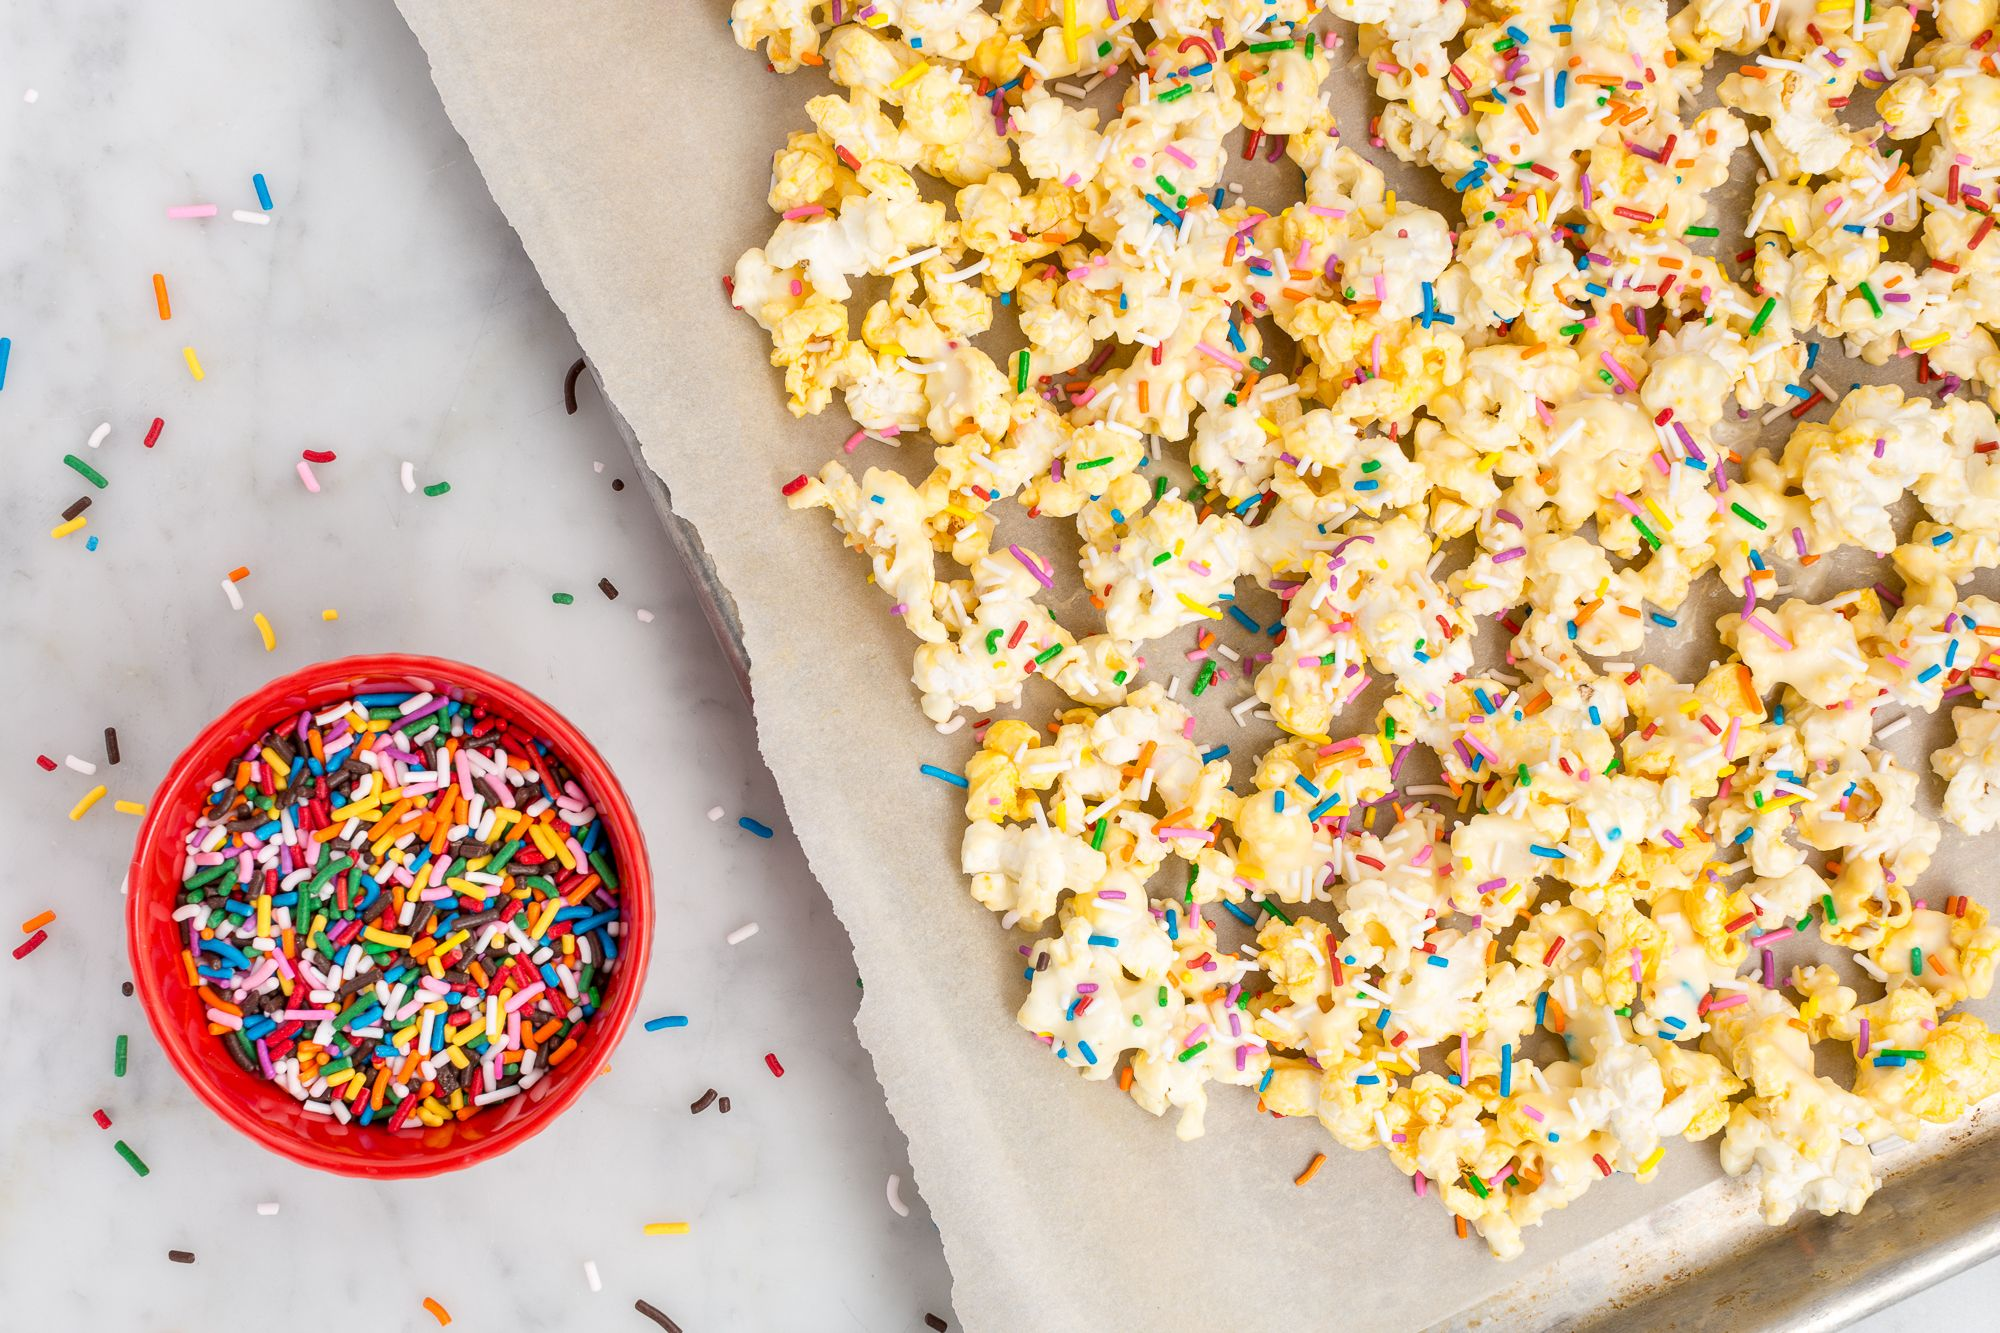 7 Popcorn Hacks That Will Seriously Upgrade Movie Night 7 Popcorn Hacks That Will Seriously Upgrade Movie Night new pics